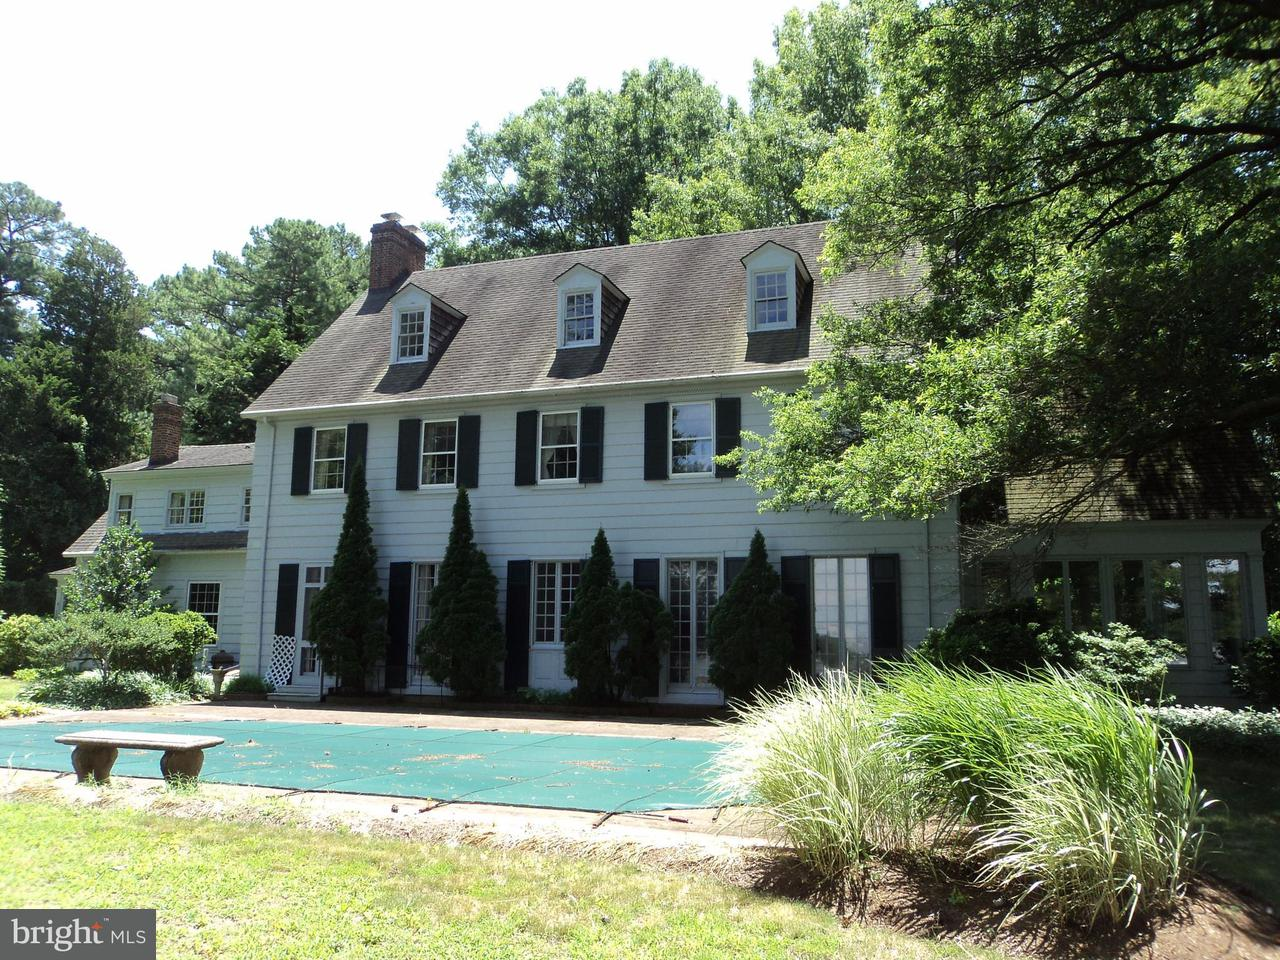 Single Family Home for Sale at 8620ET AL. DONCASTER Road 8620ET AL. DONCASTER Road Easton, Maryland 21601 United States